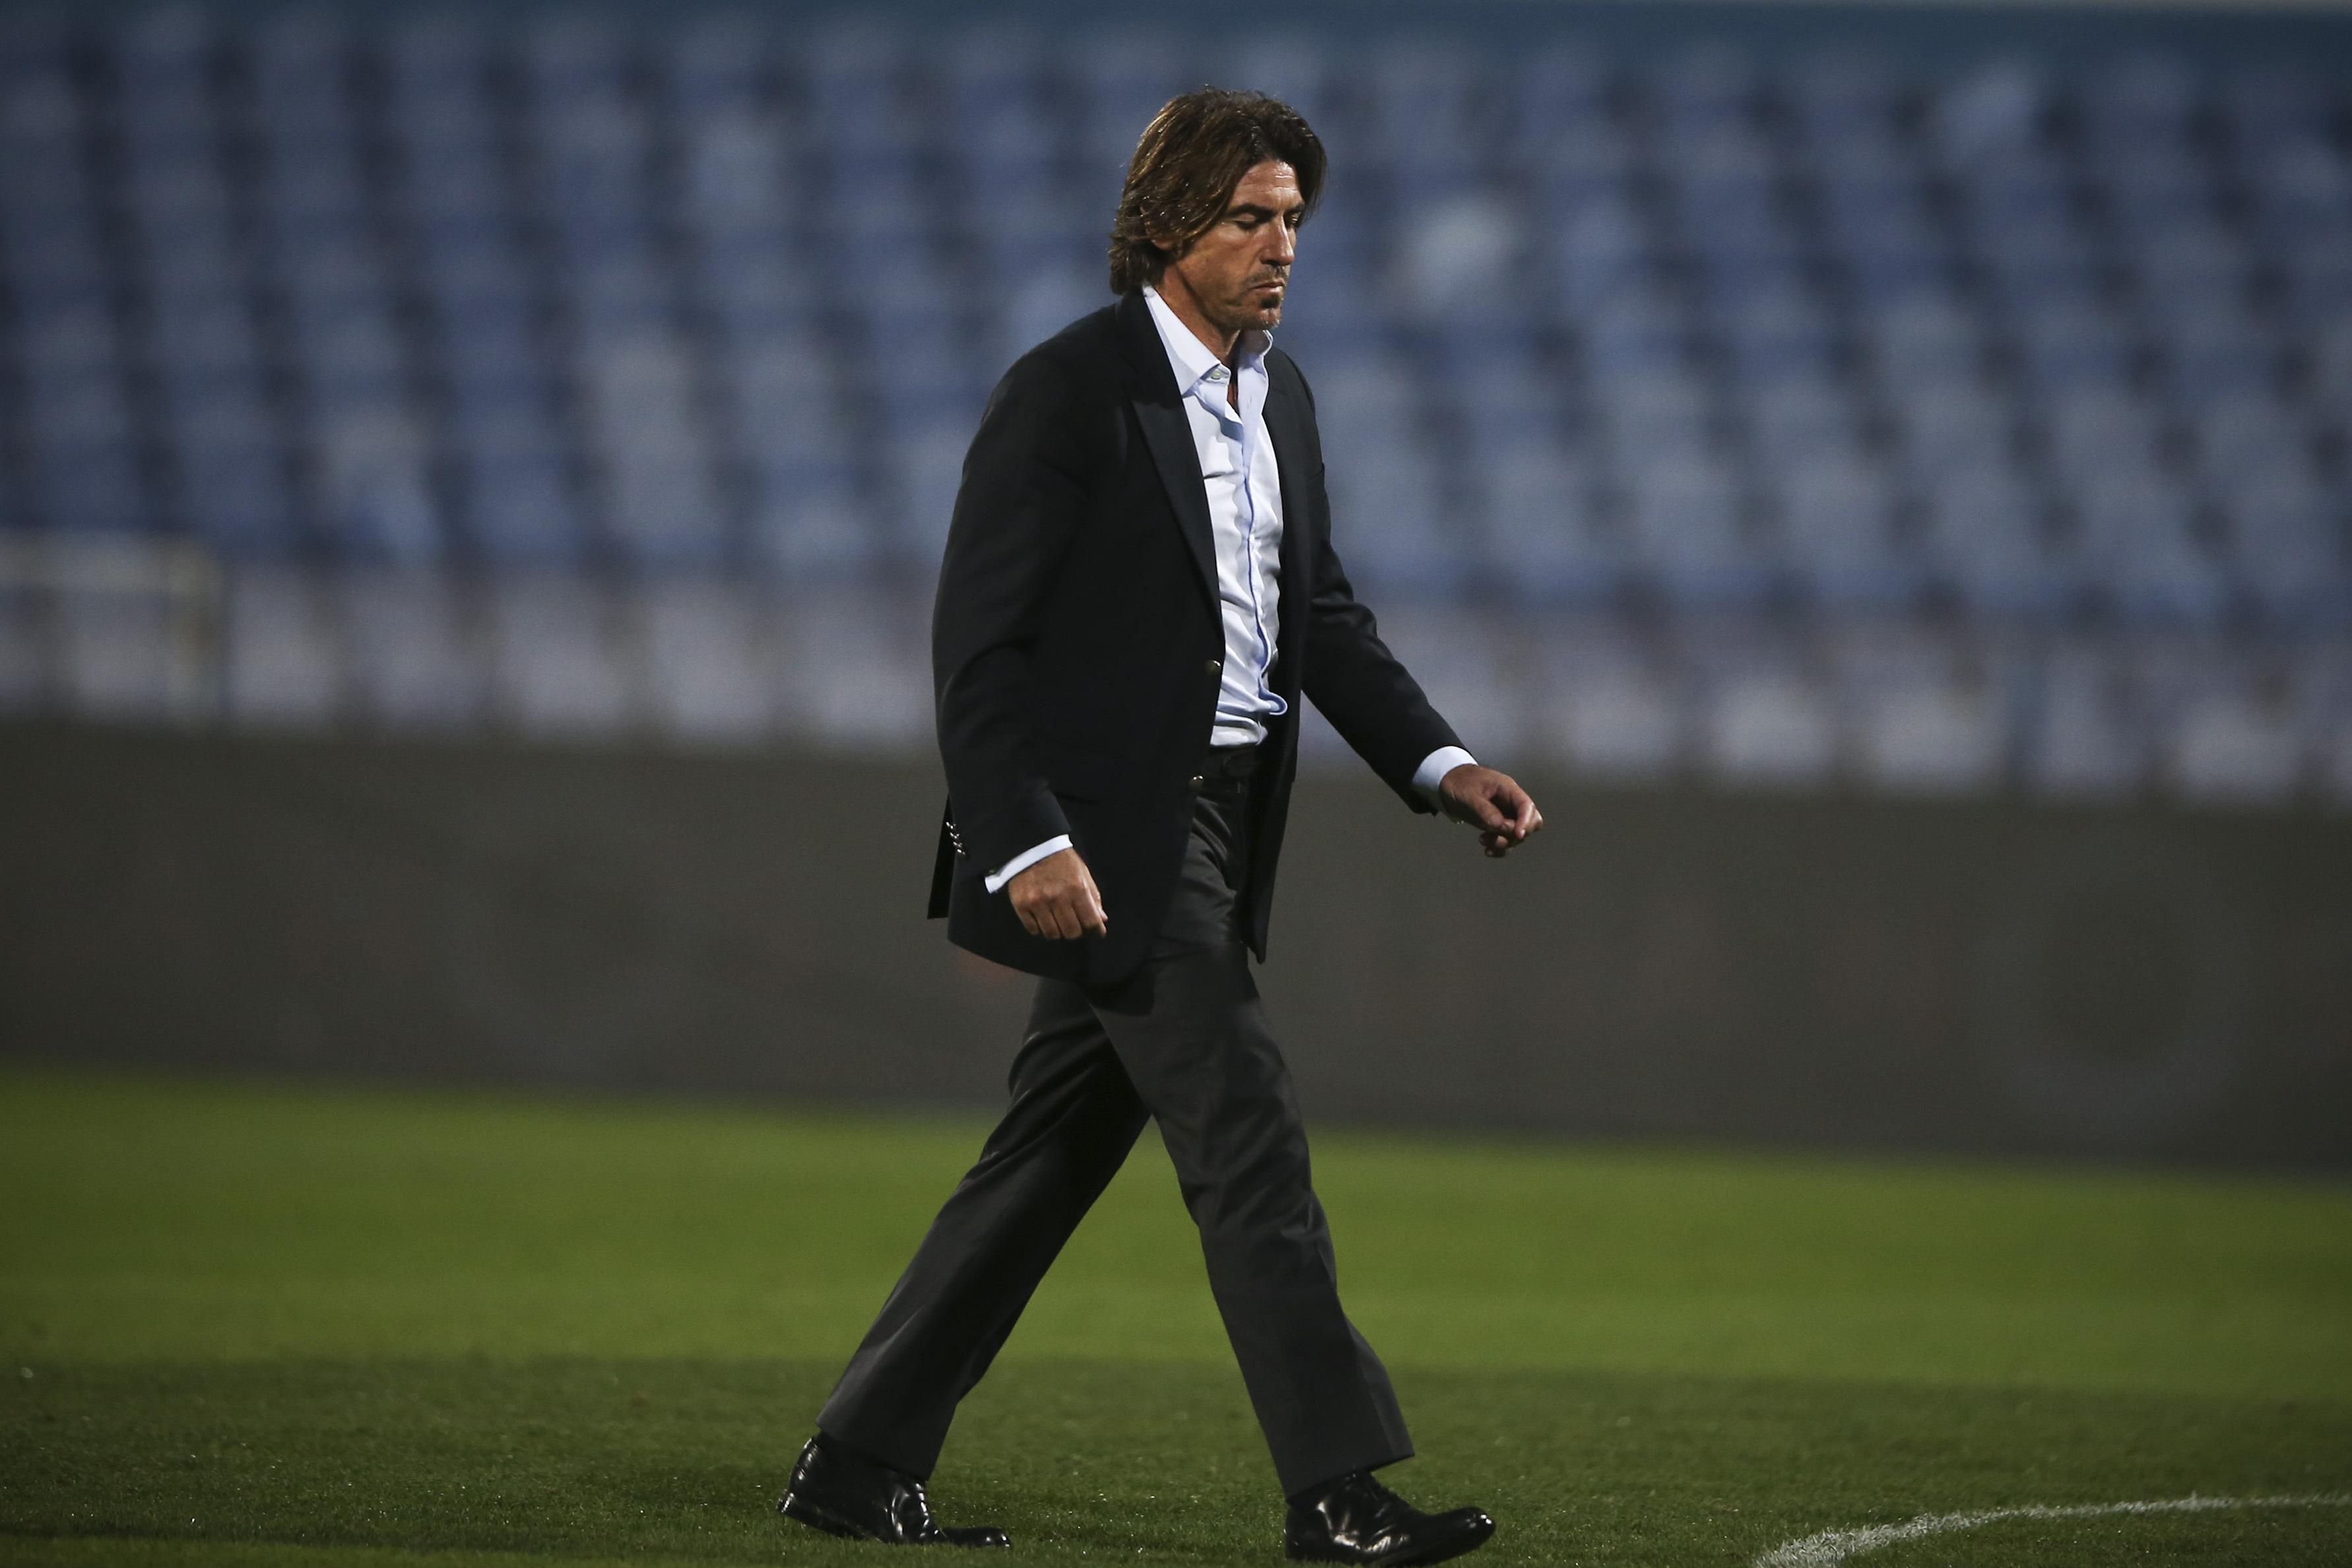 Standard Liège, de Sá Pinto, vence com golo de Orlando Sá